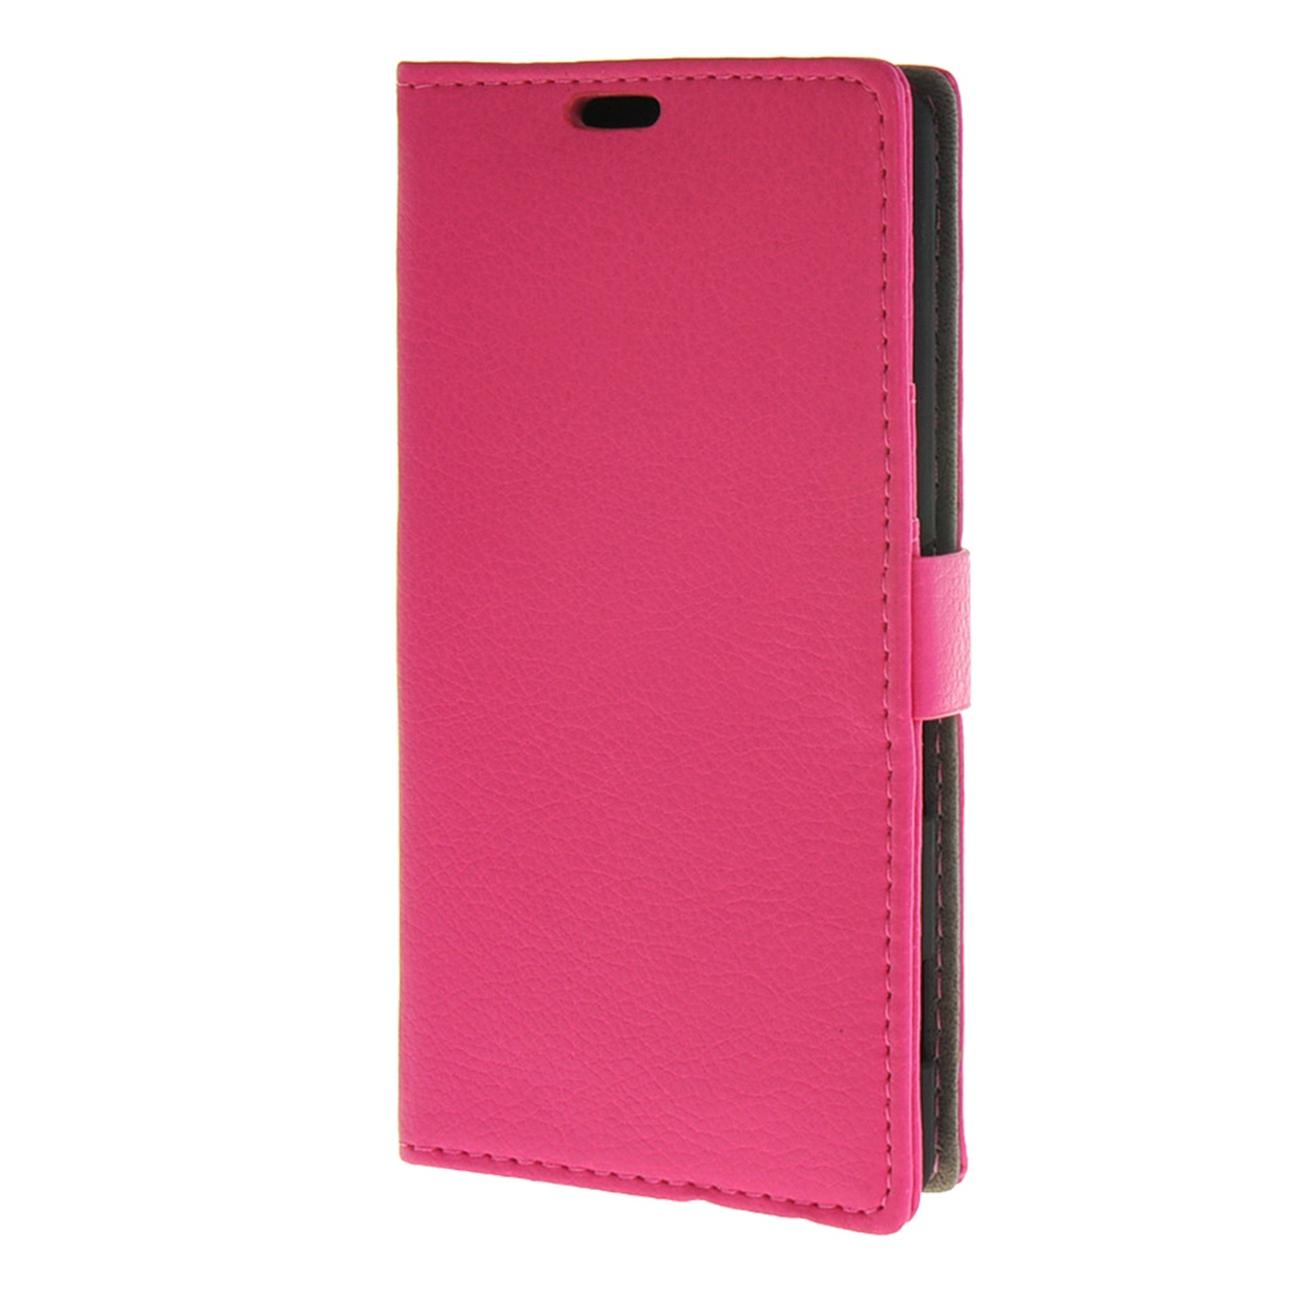 MOONCASE mooncase чехол для sony xperia m4 aqua wallet card slot with kickstand flip leather back hot pink